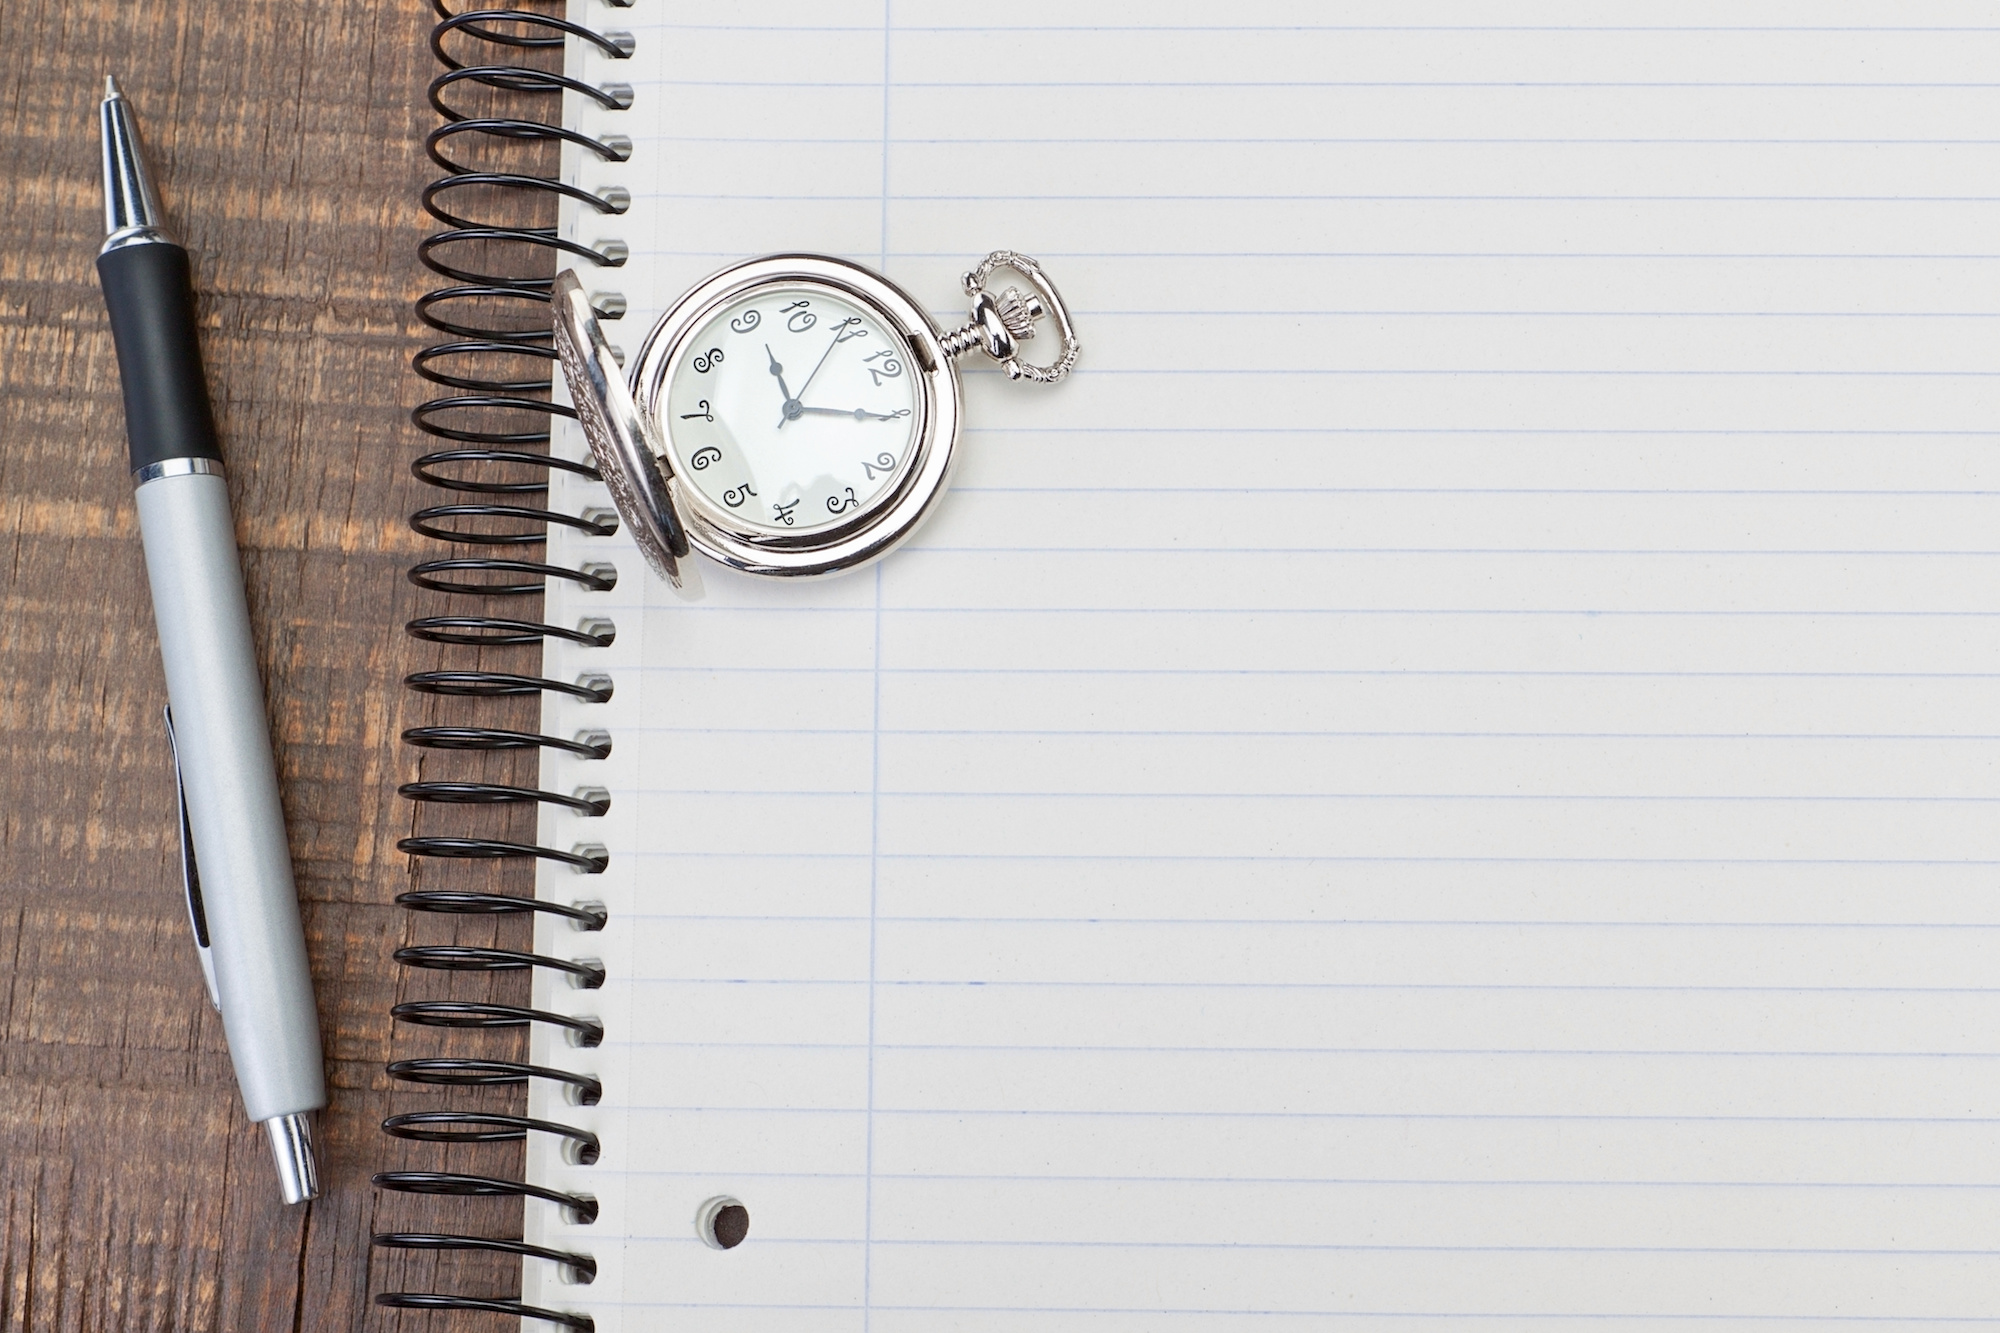 Fantetti Legal Maintaining Meeting Minutes.jpeg